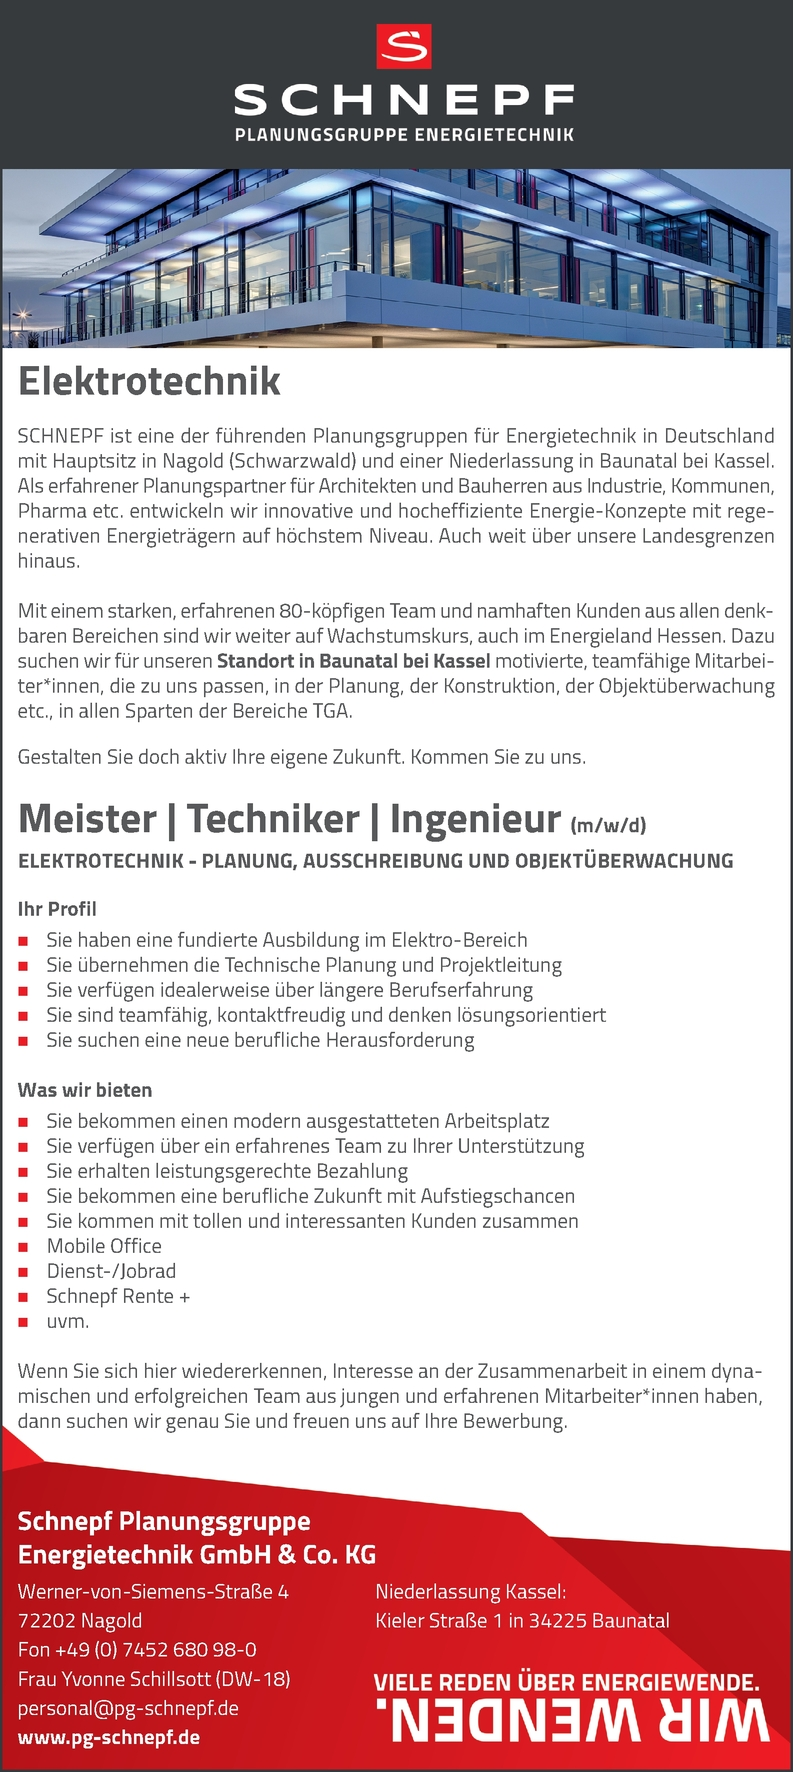 Meister Techniker Ingenieur Elektrotechnik